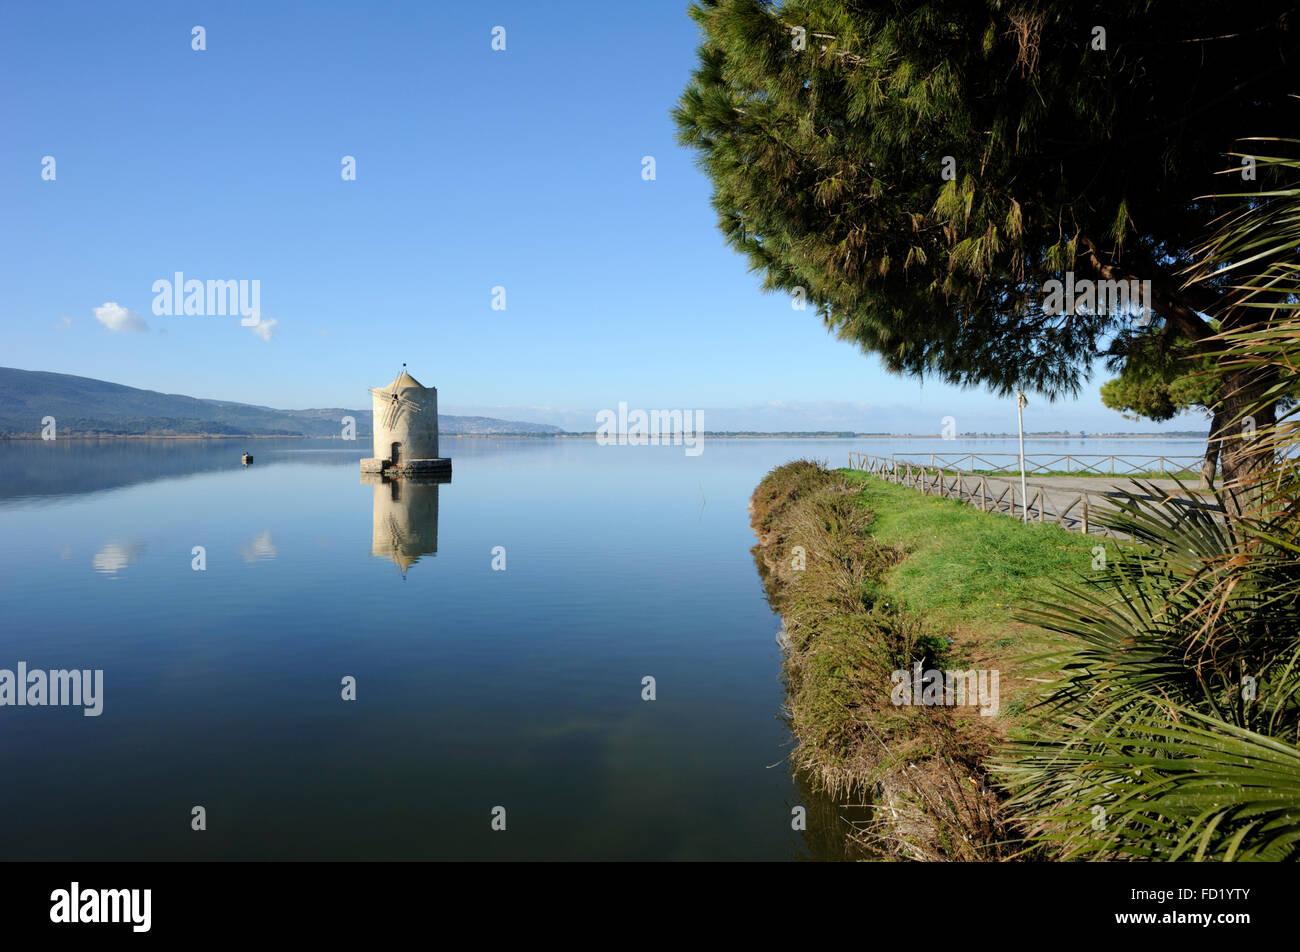 italy, tuscany, argentario, orbetello, lagoon, ancient windmill - Stock Image